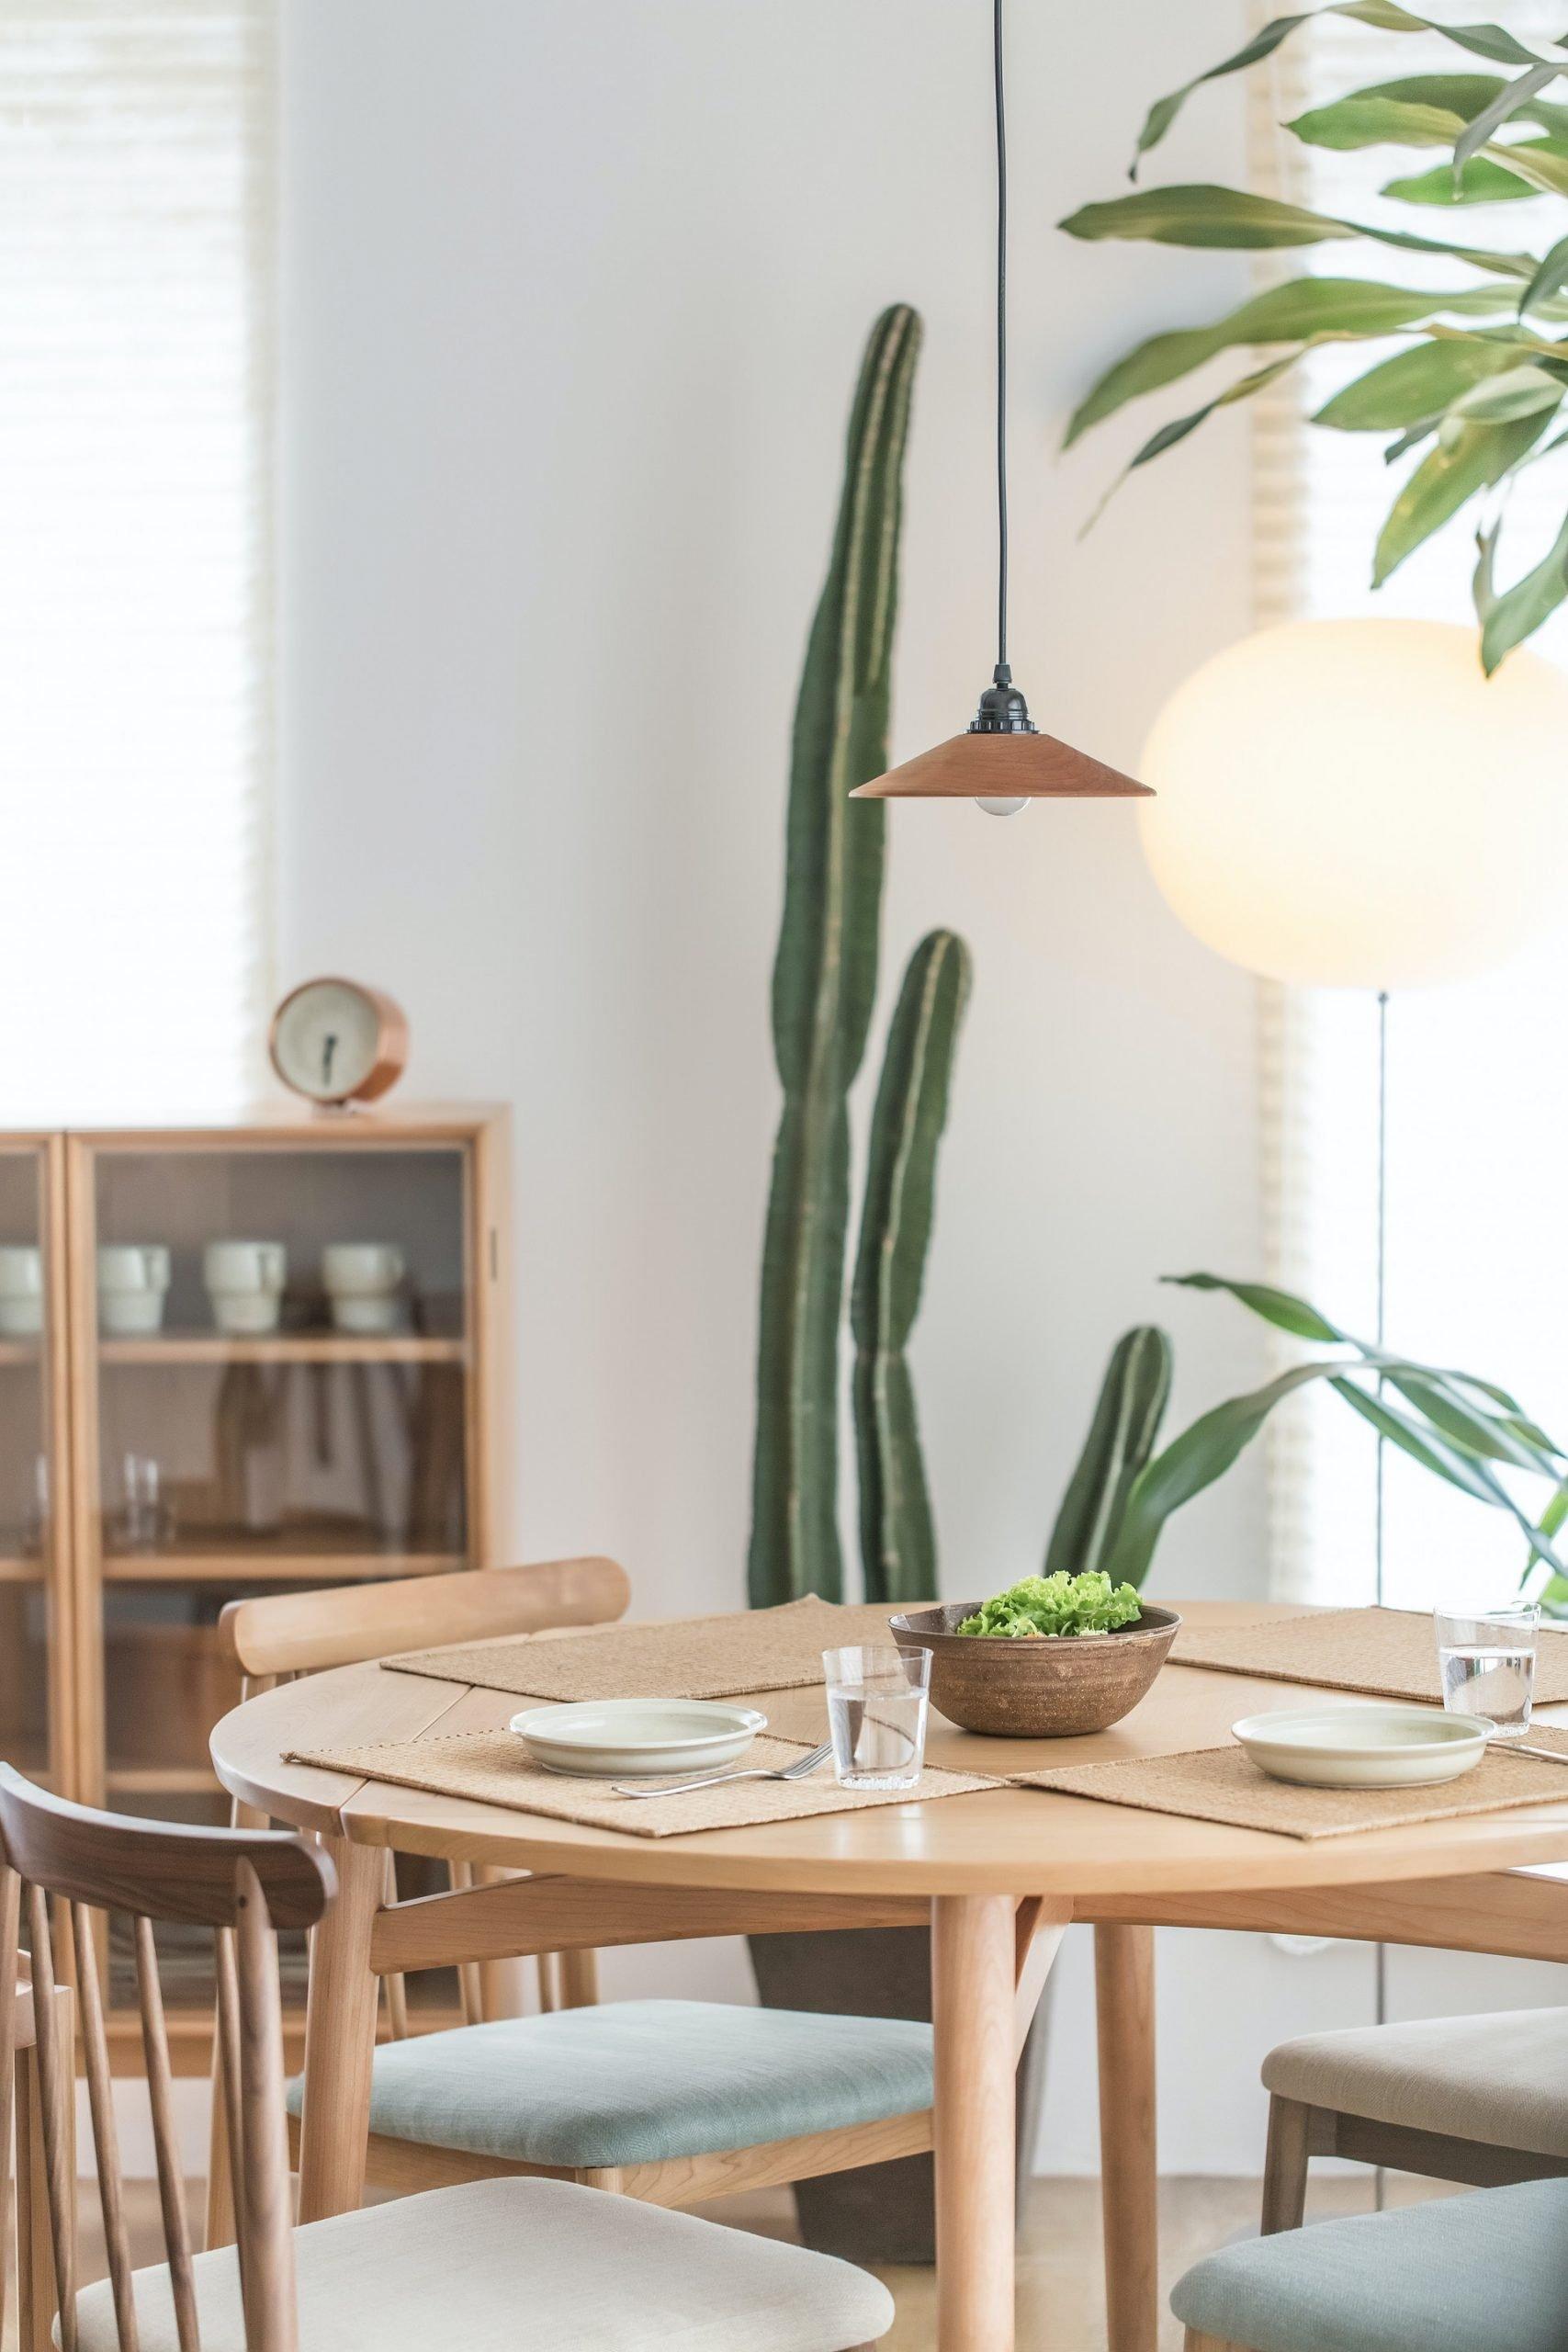 Green-cactus-close-dinning-table_NoLocation_1_1920x2880_etovilla